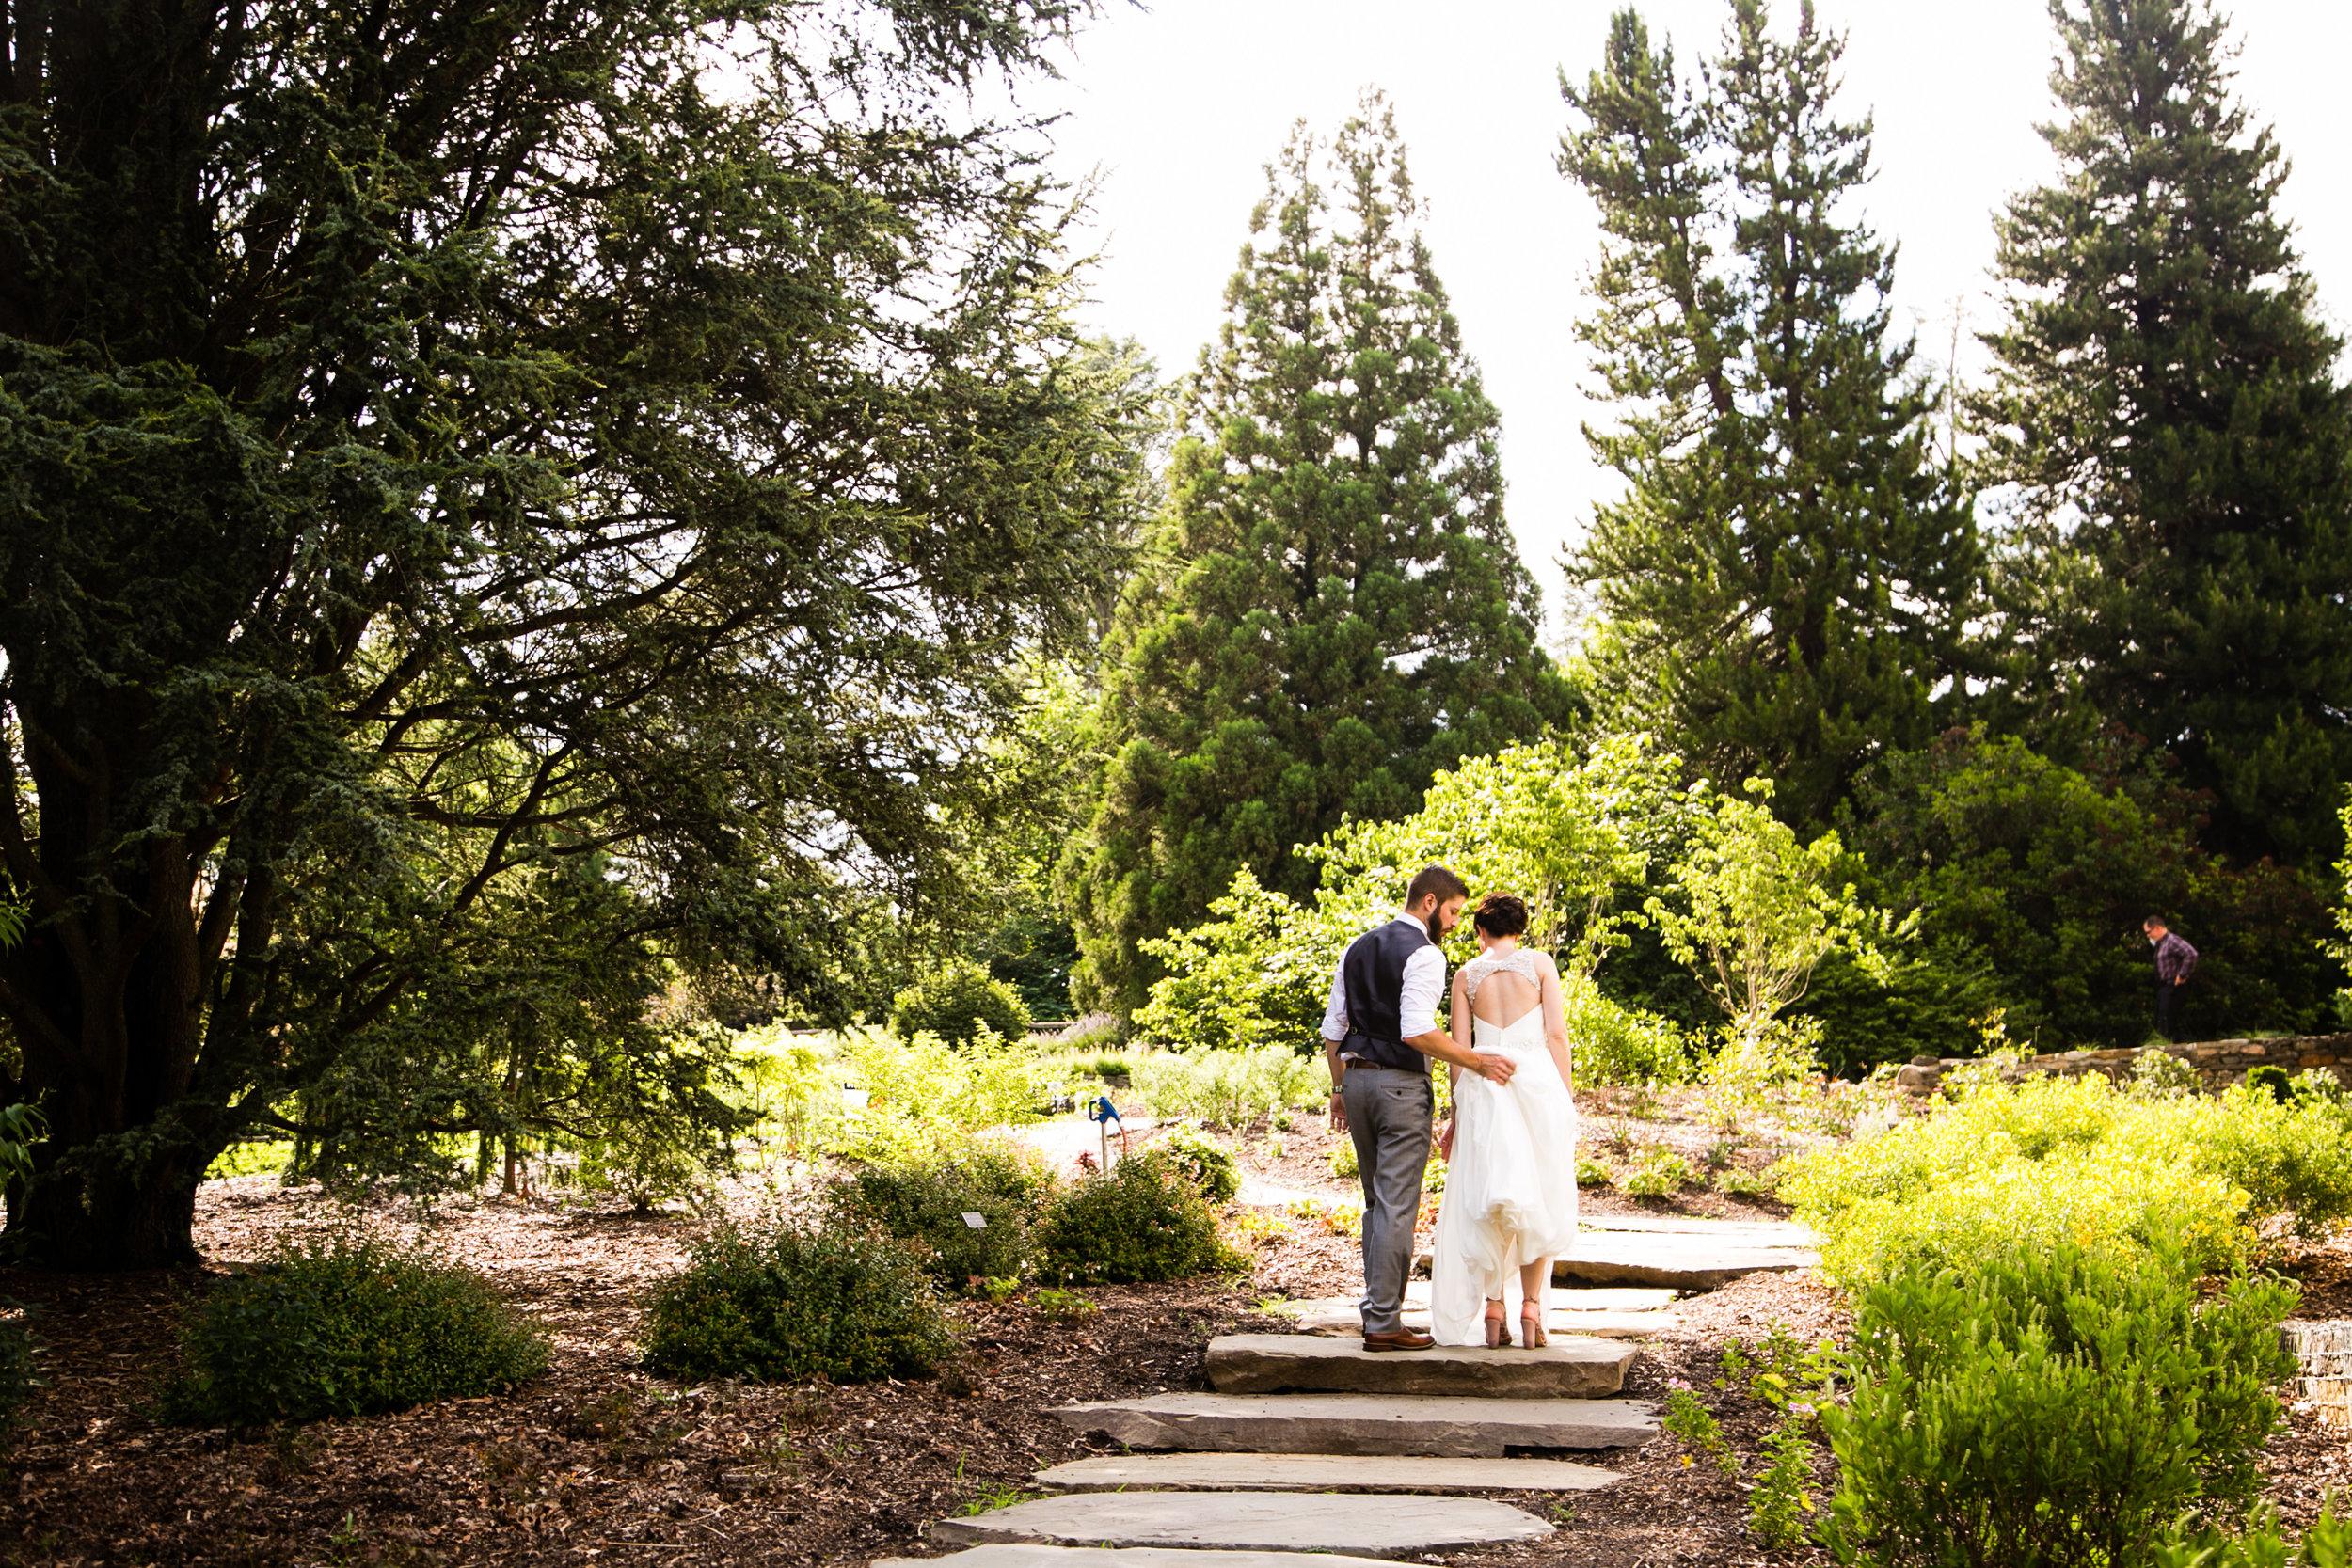 TYLER ARBORETUM WEDDING PHOTOGRAPHY LOVESTRUCK PICTURES-037.jpg